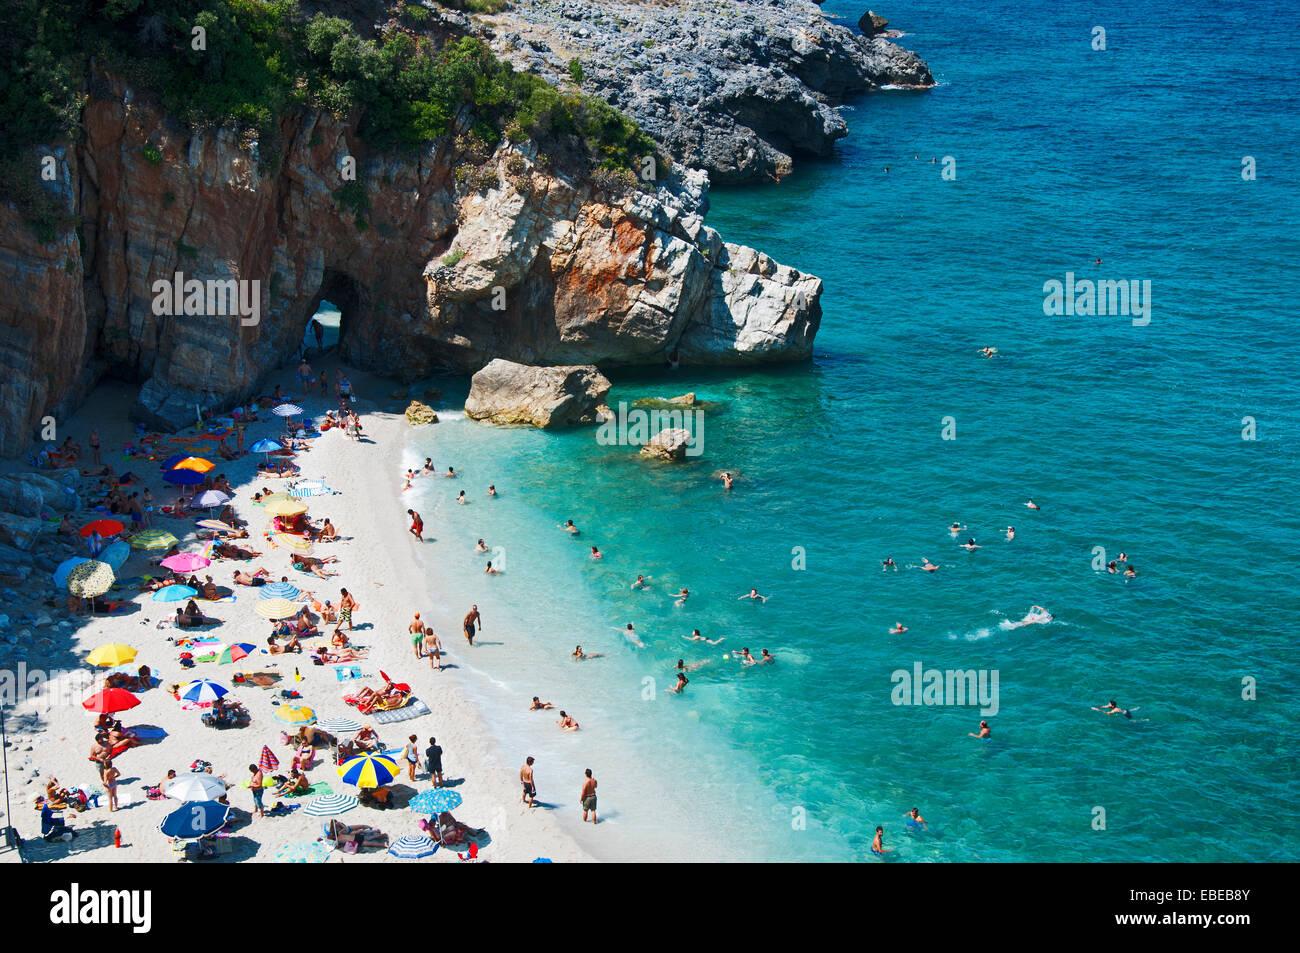 Busy beach of Milopotamos on Pelion Peninsula, Thessaly, Greece - Stock Image